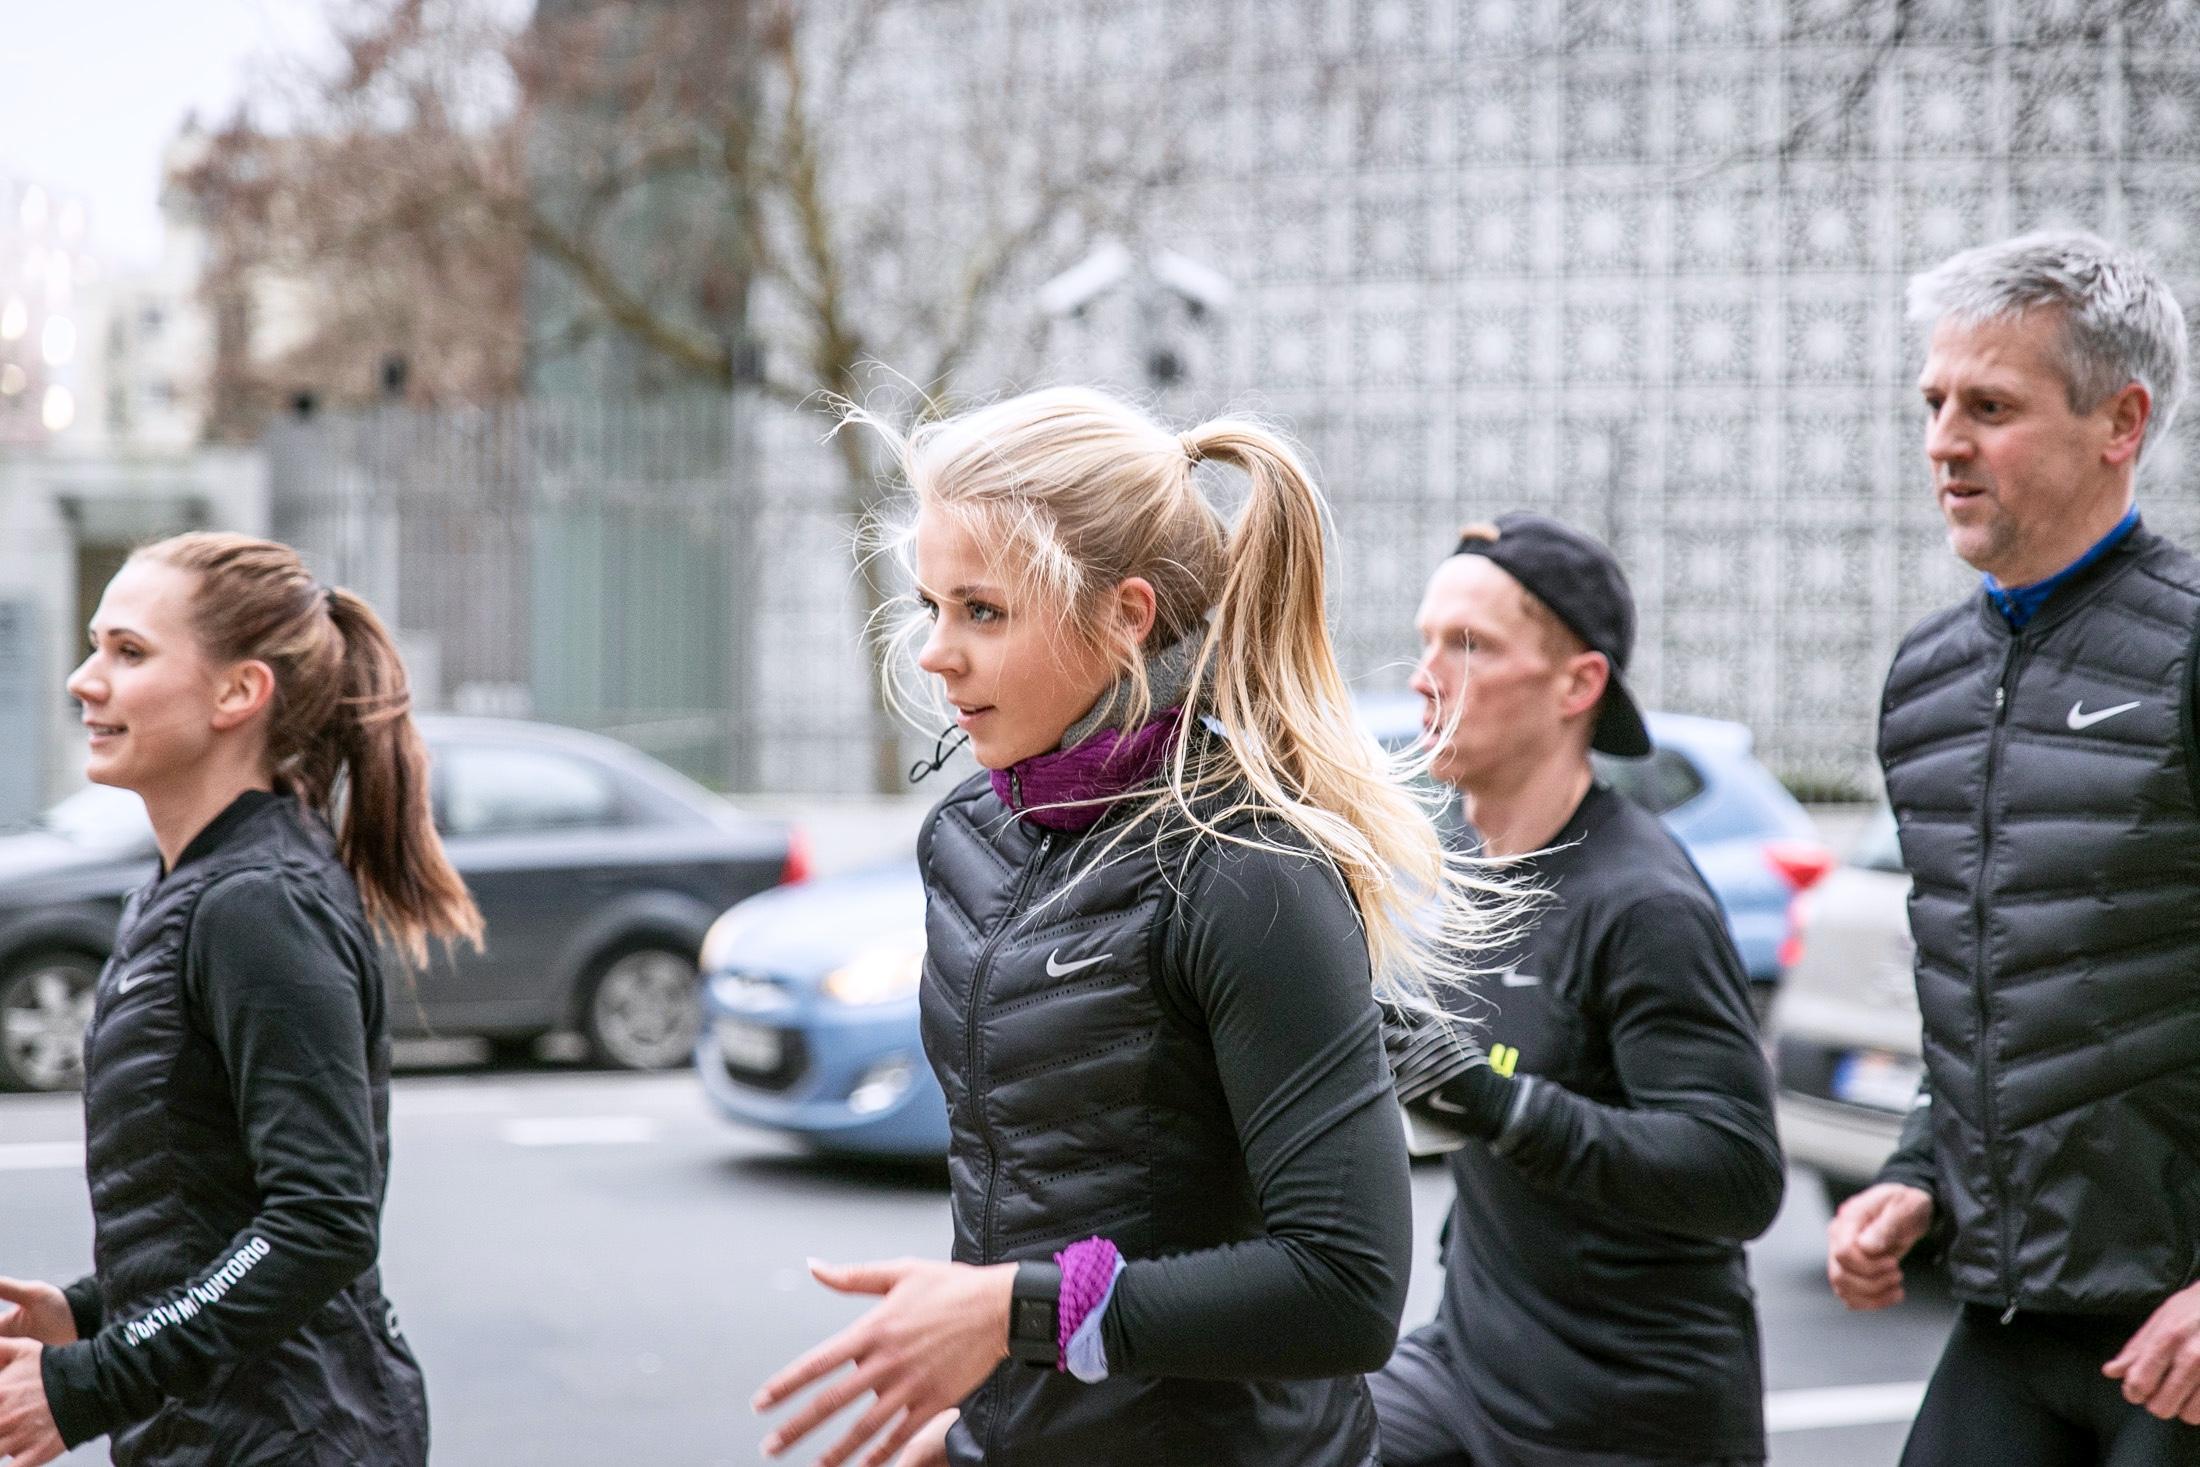 160210_Nike_Berlin_Rio_Medien_Run_053